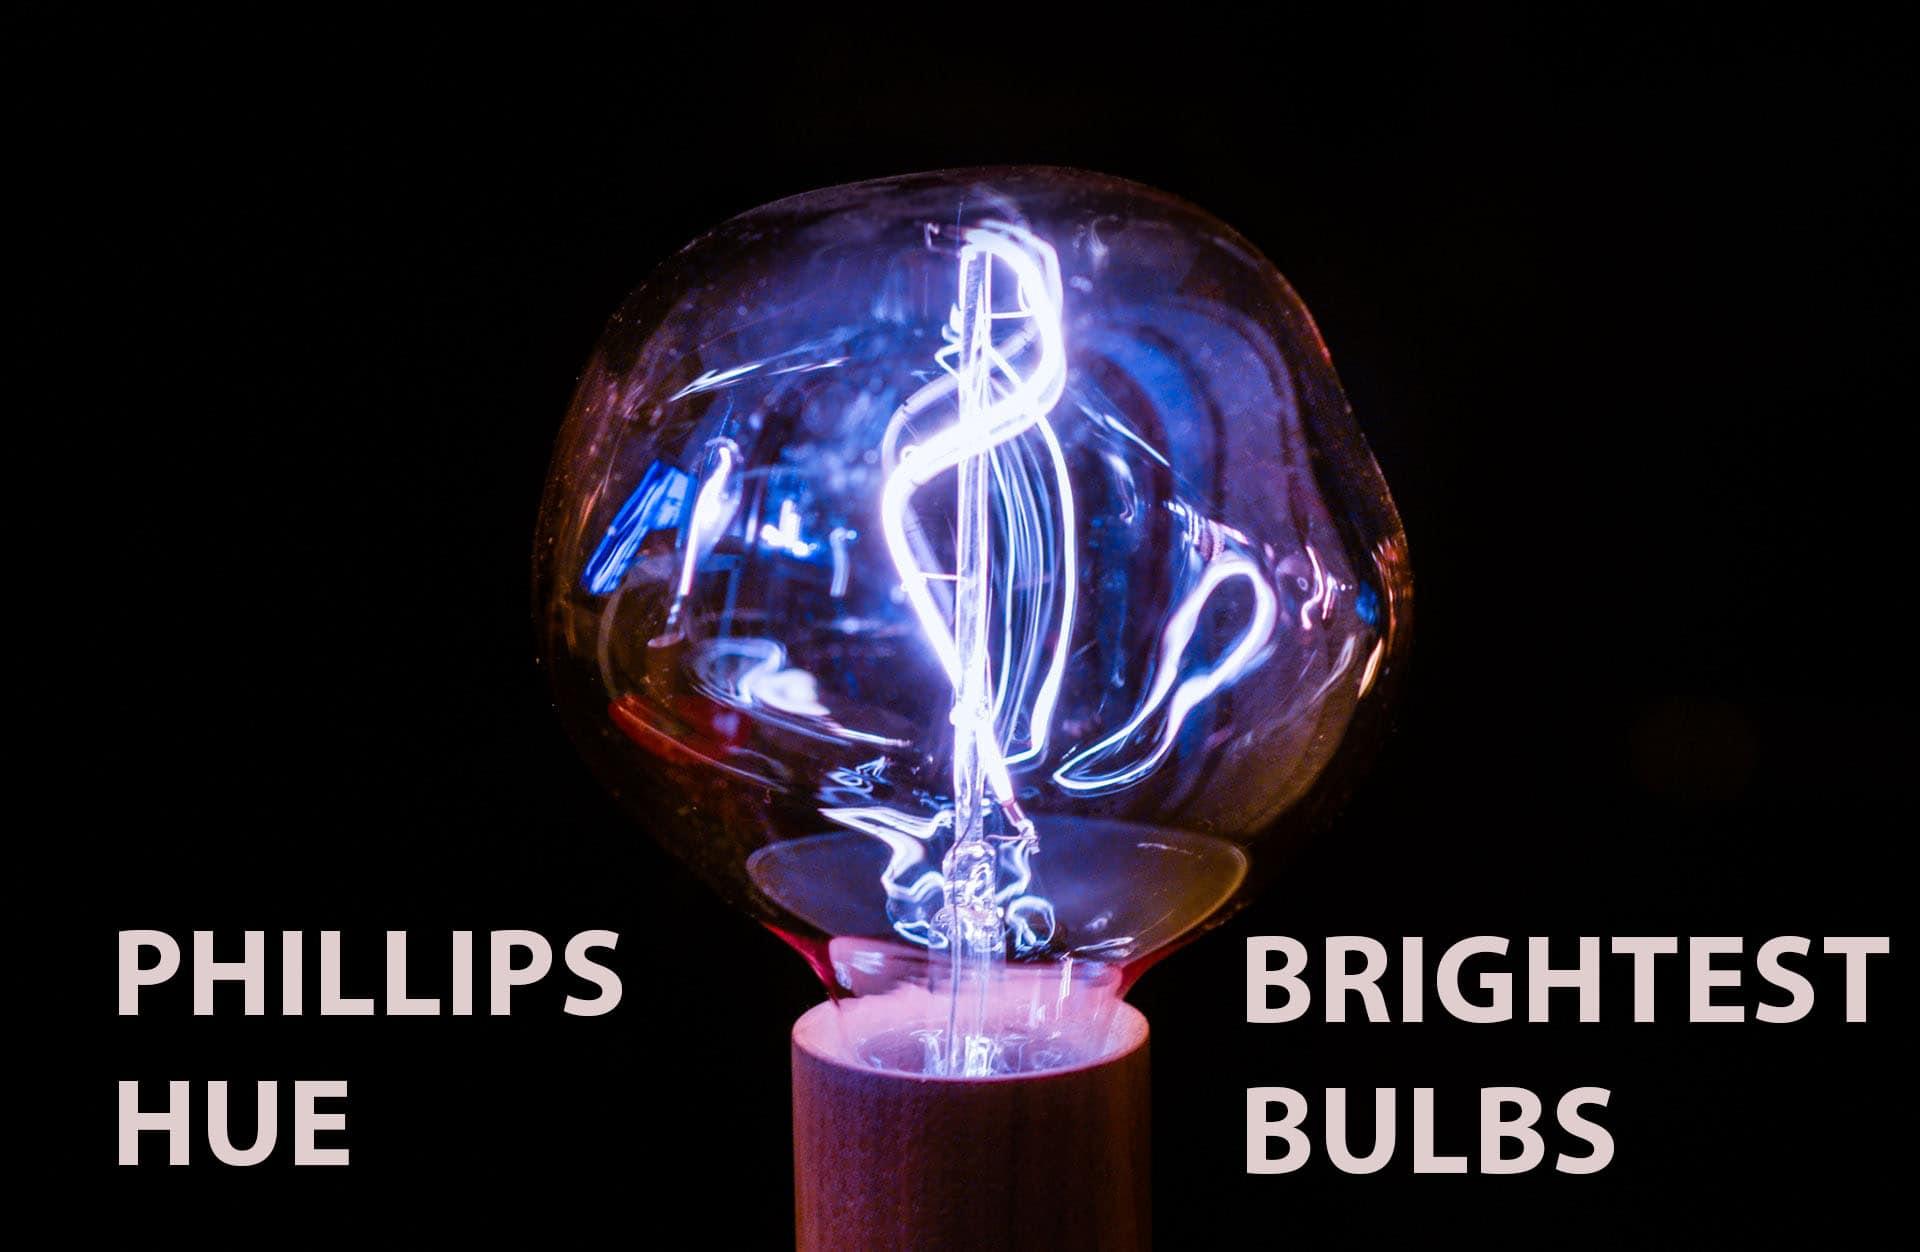 Phillips Hue brightest bulbs